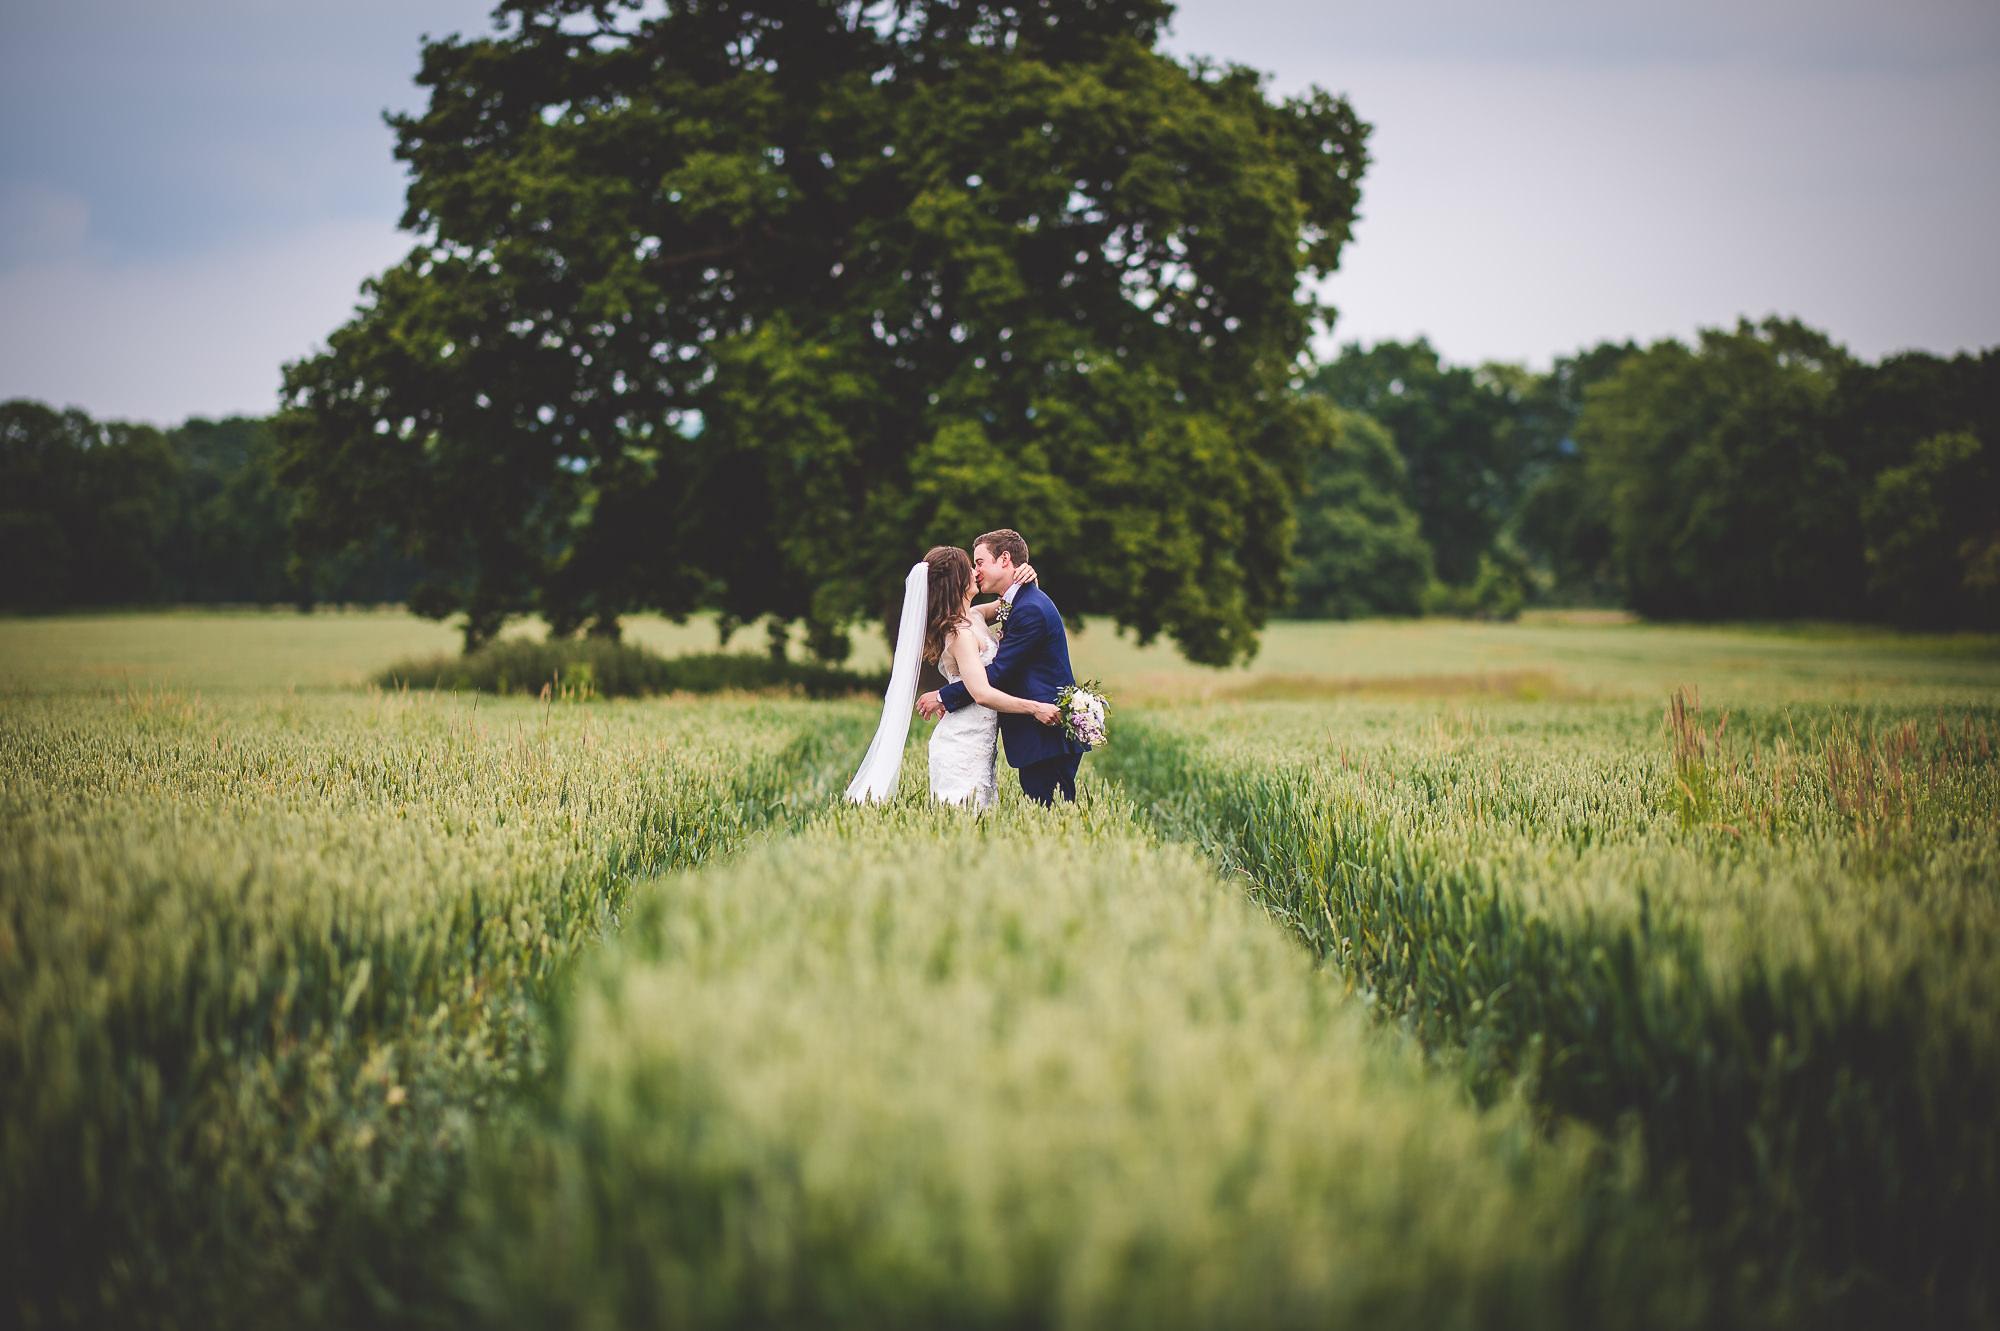 Veils & Bales Wedding Photography | Charlie & Steve SCSS 130